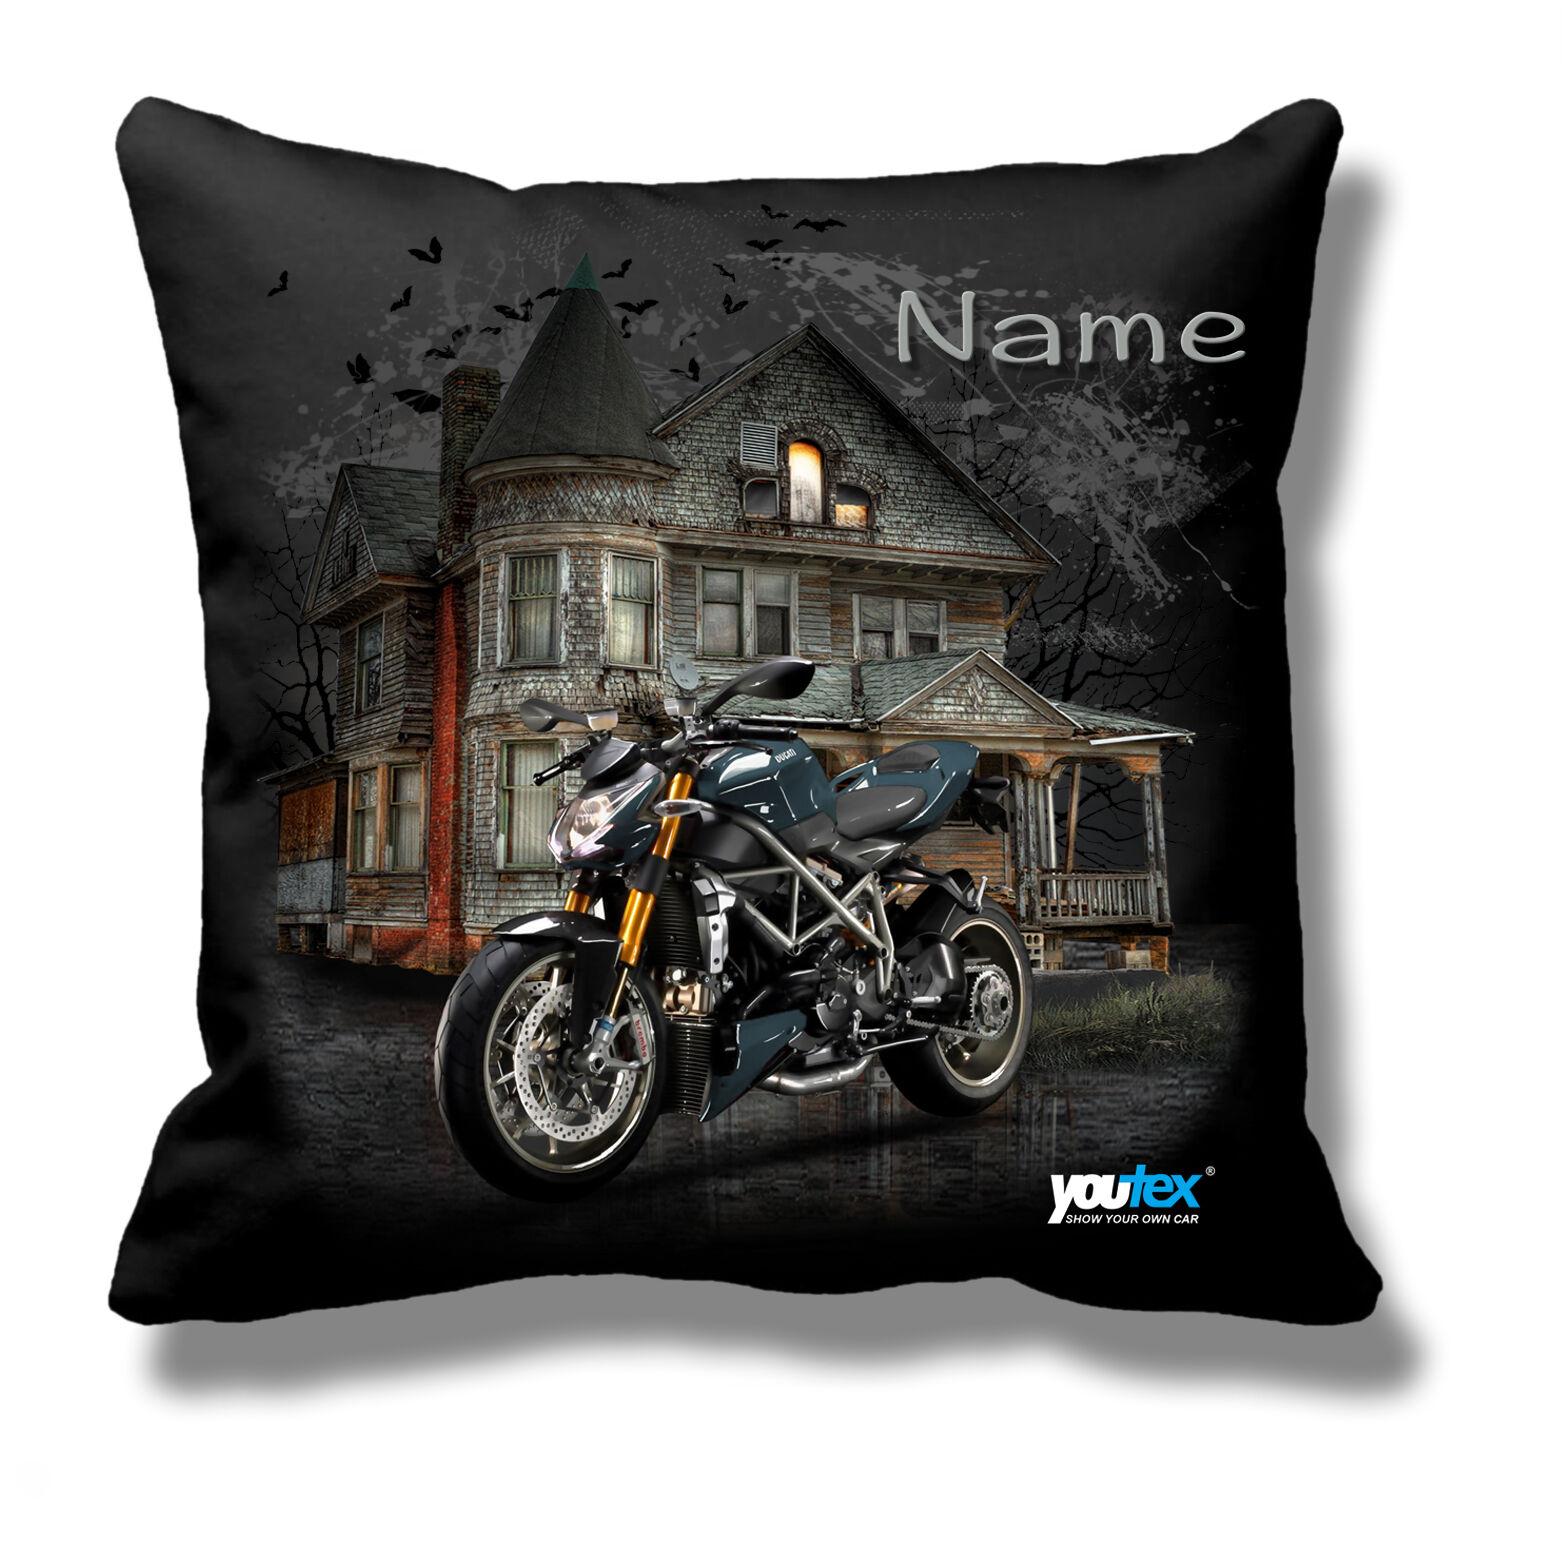 Ducati Streetfighter Tuning T Shirt Shirt T-Shirt original original original YOUTEX | Sonderkauf  | Neuartiges Design  | Attraktives Aussehen  c083c3